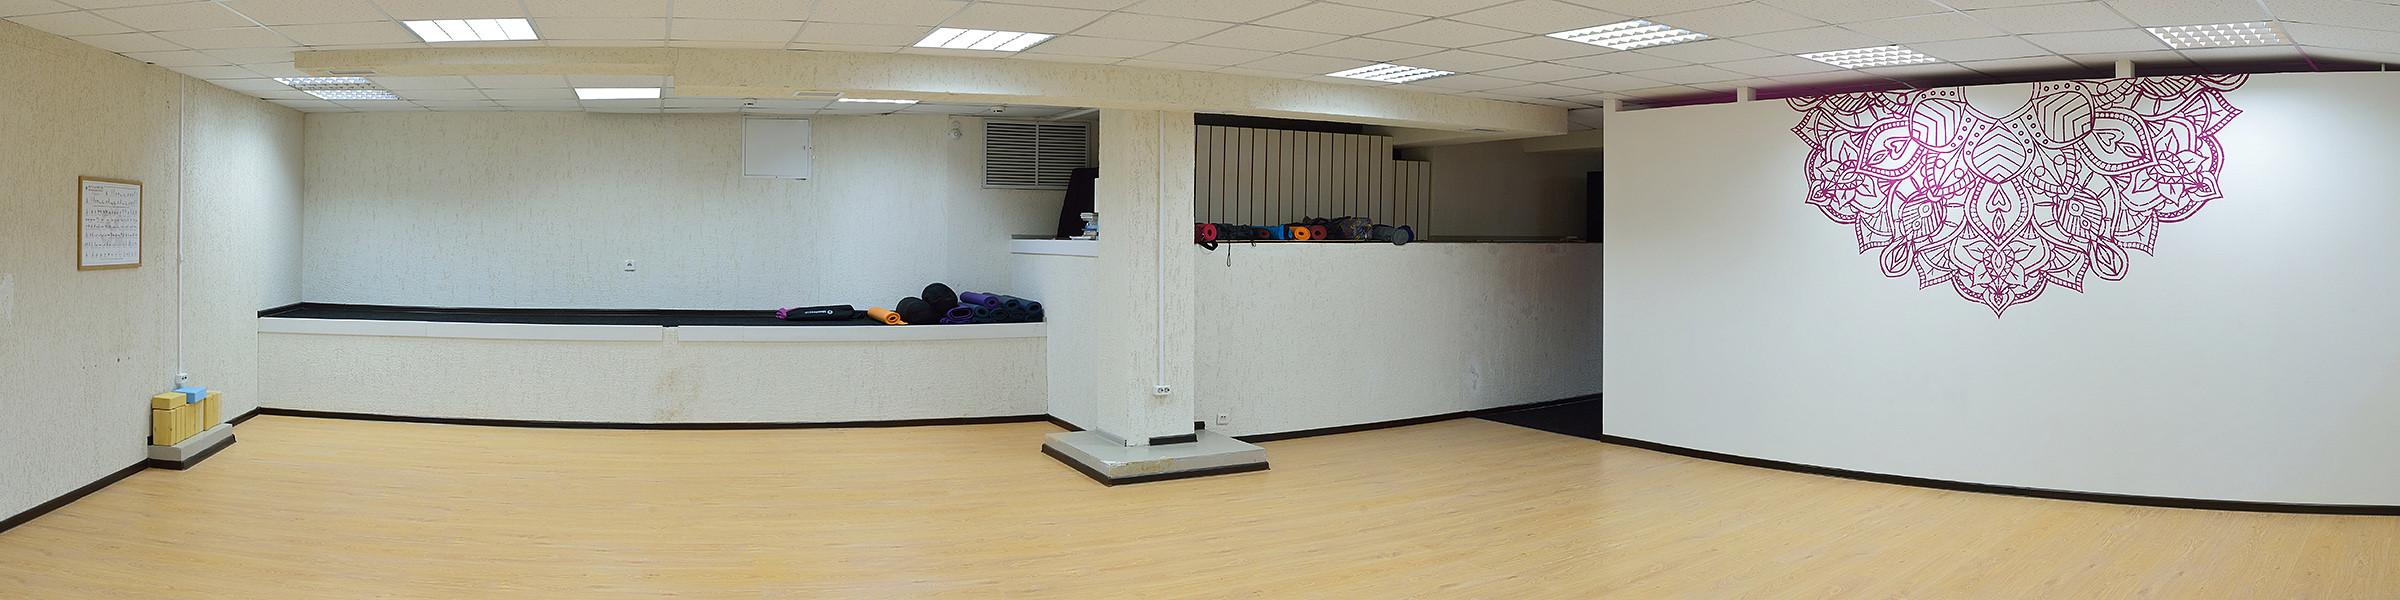 студия йоги й новосибирск интерьер